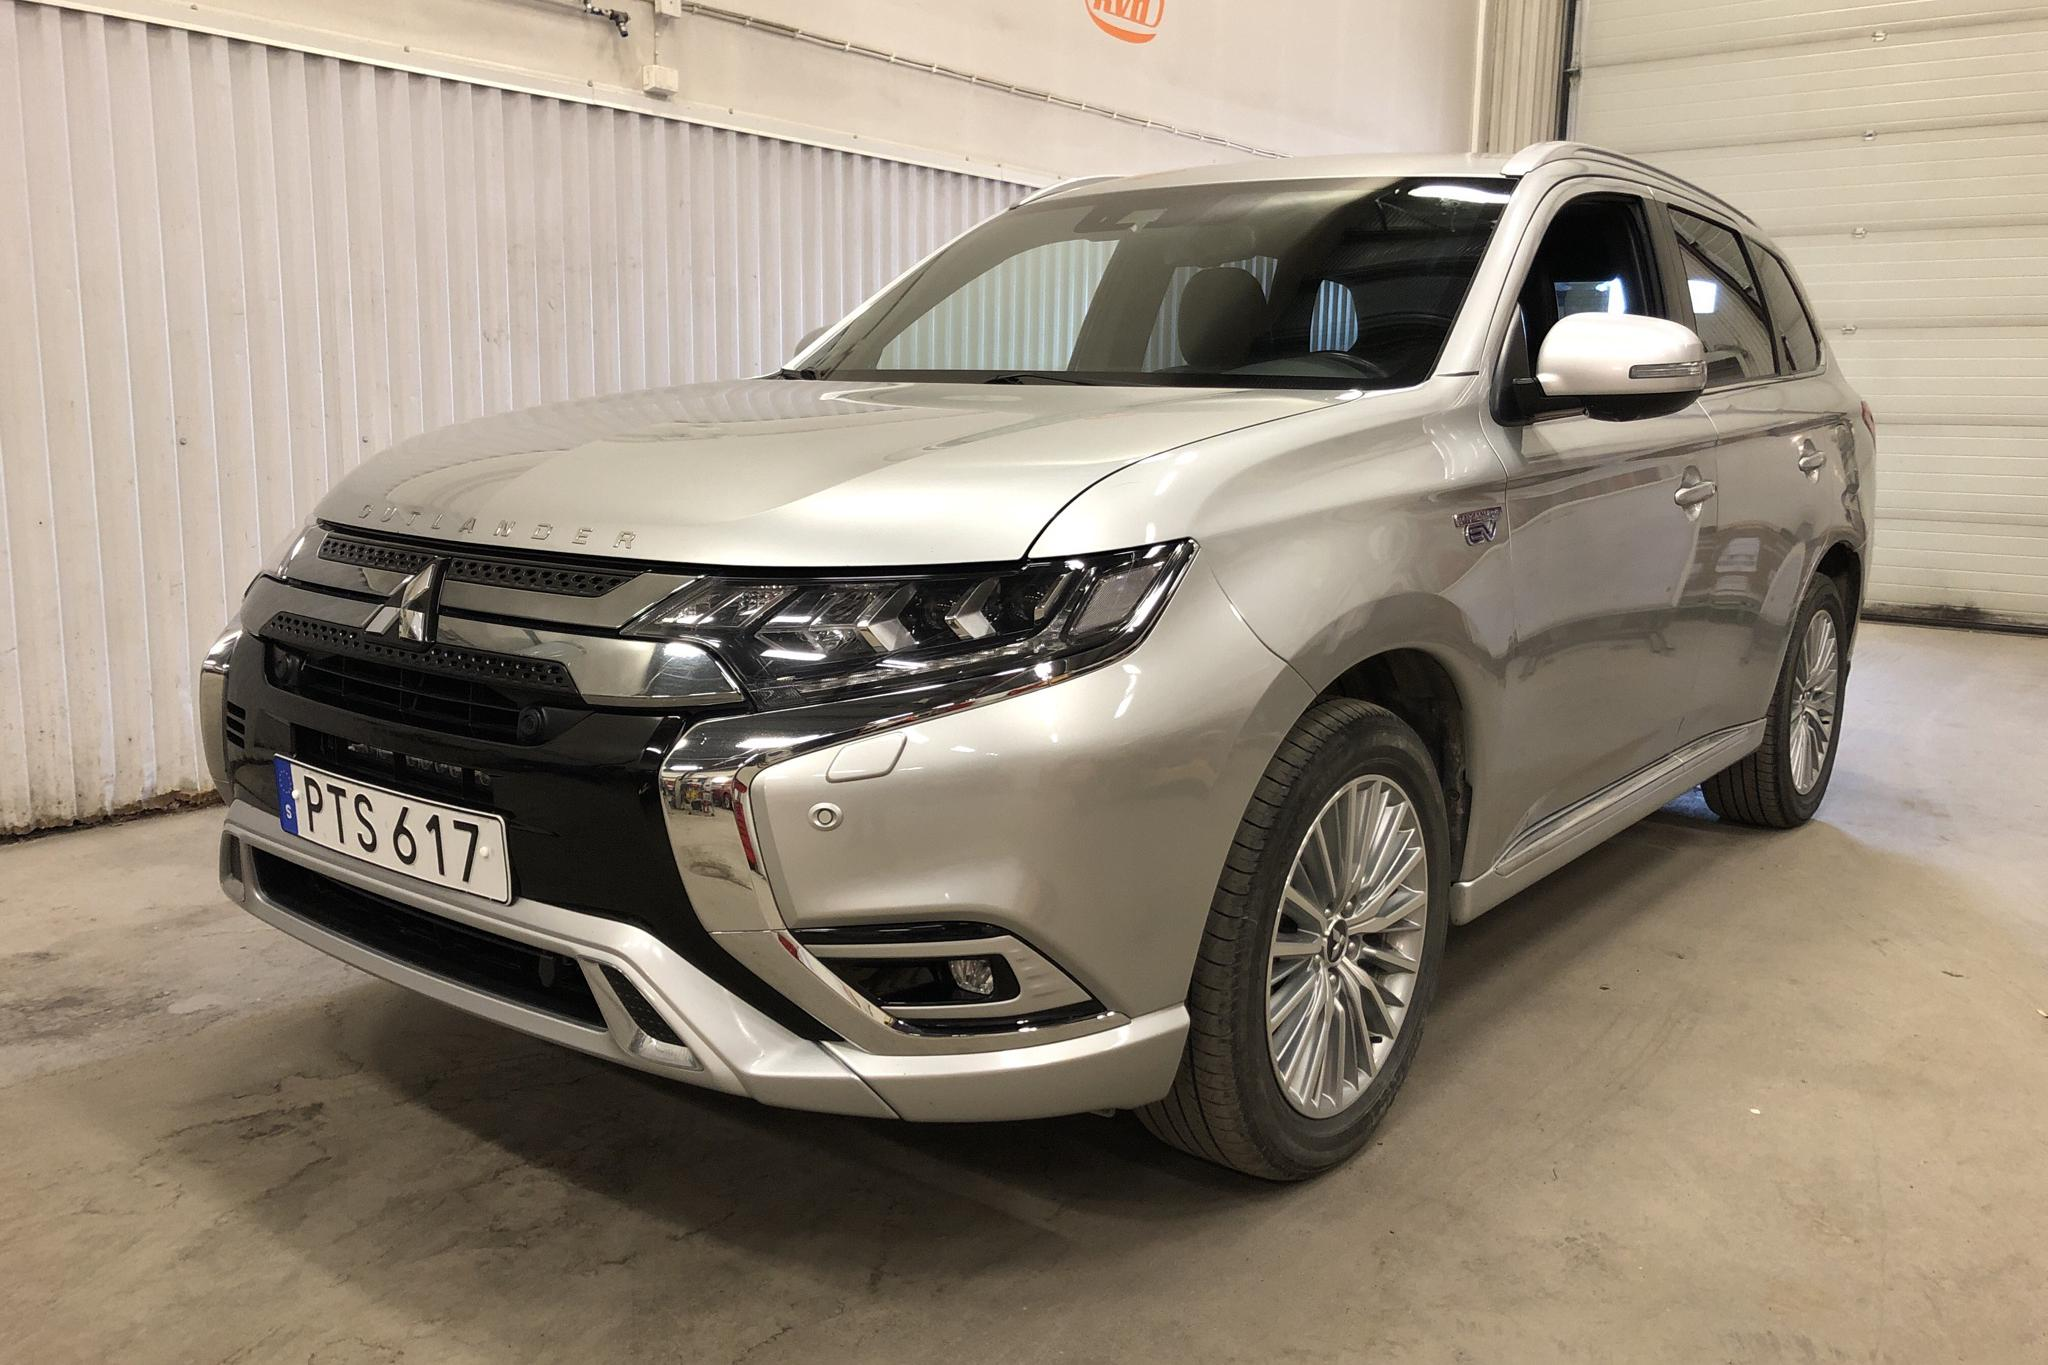 Mitsubishi Outlander 2.4 Plug-in Hybrid 4WD (136hk)